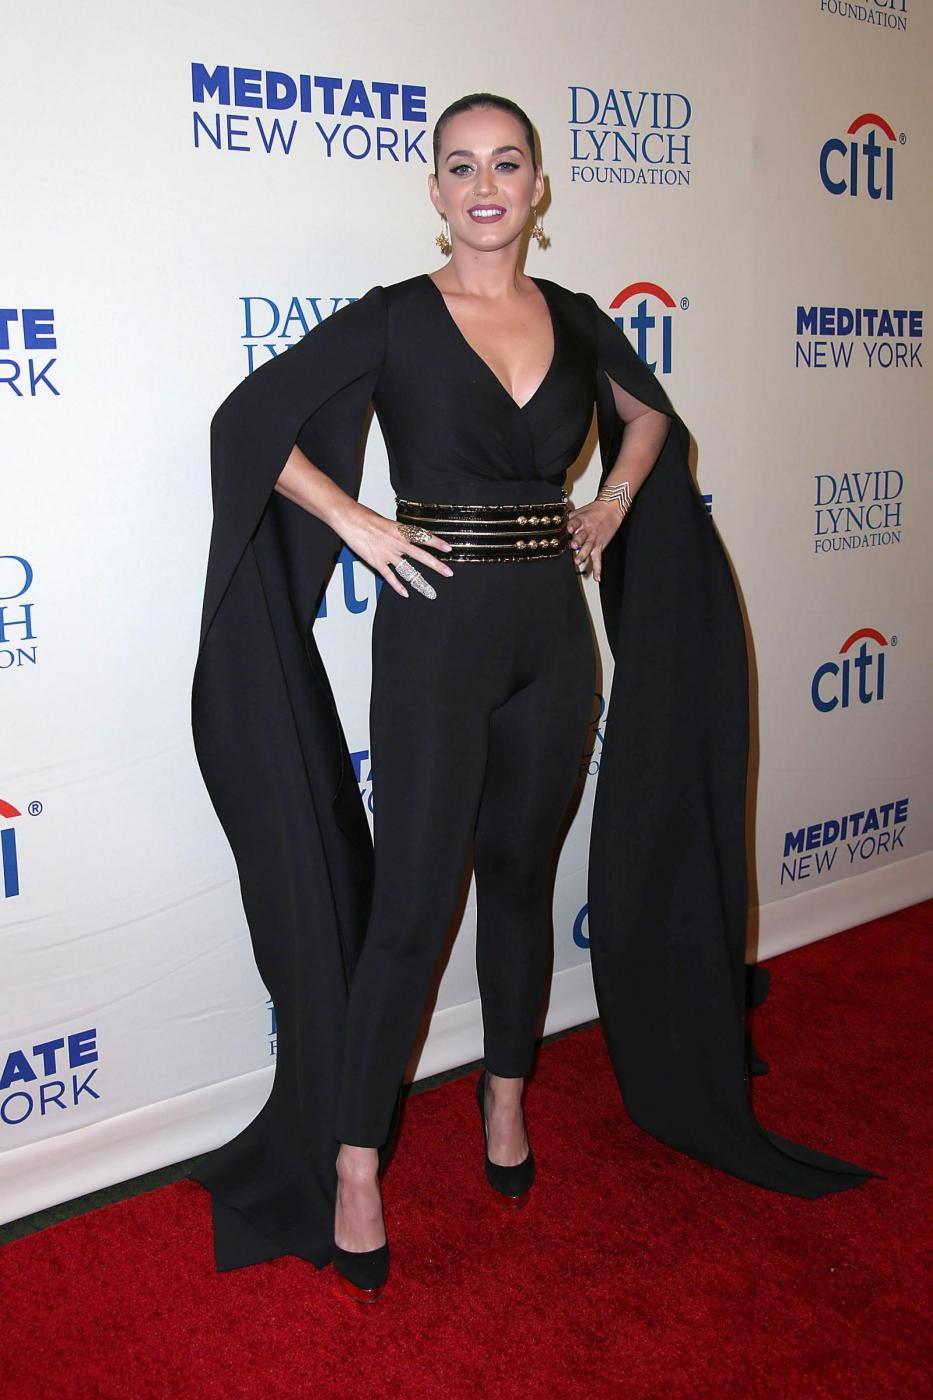 Katy Perry ingrassata? Sempre più curvy...FOTO 10